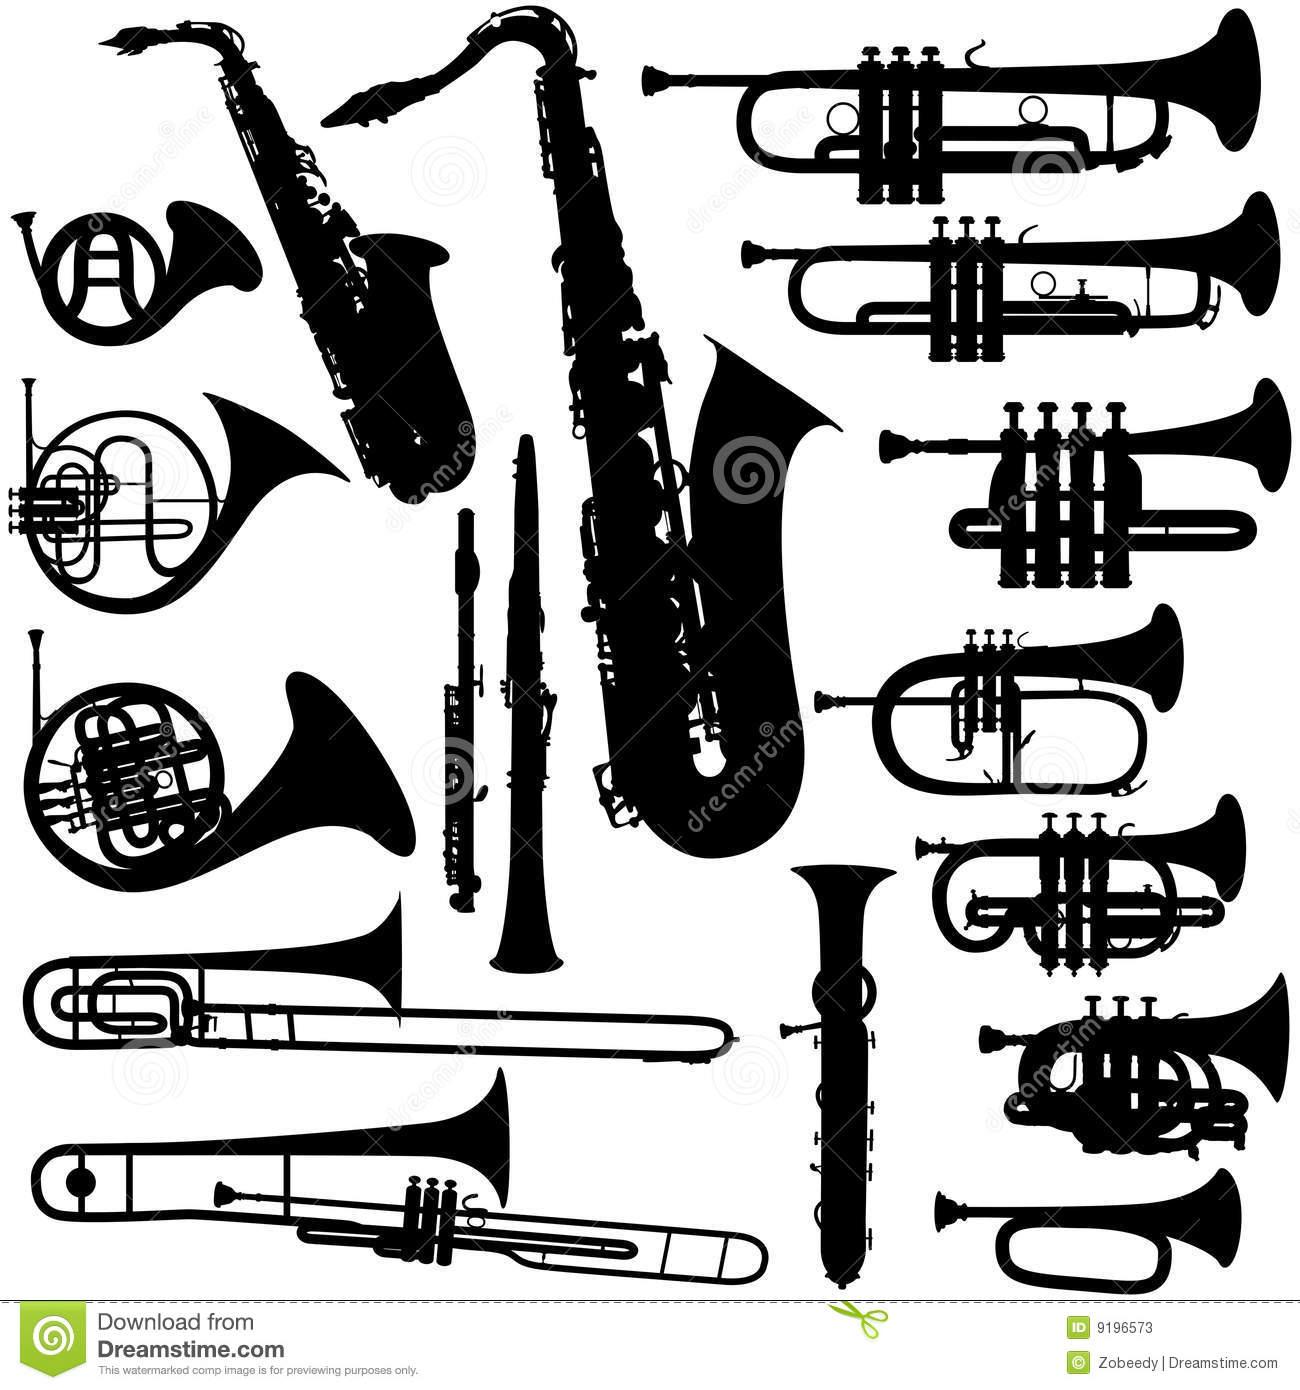 Clipart Brass Instruments.